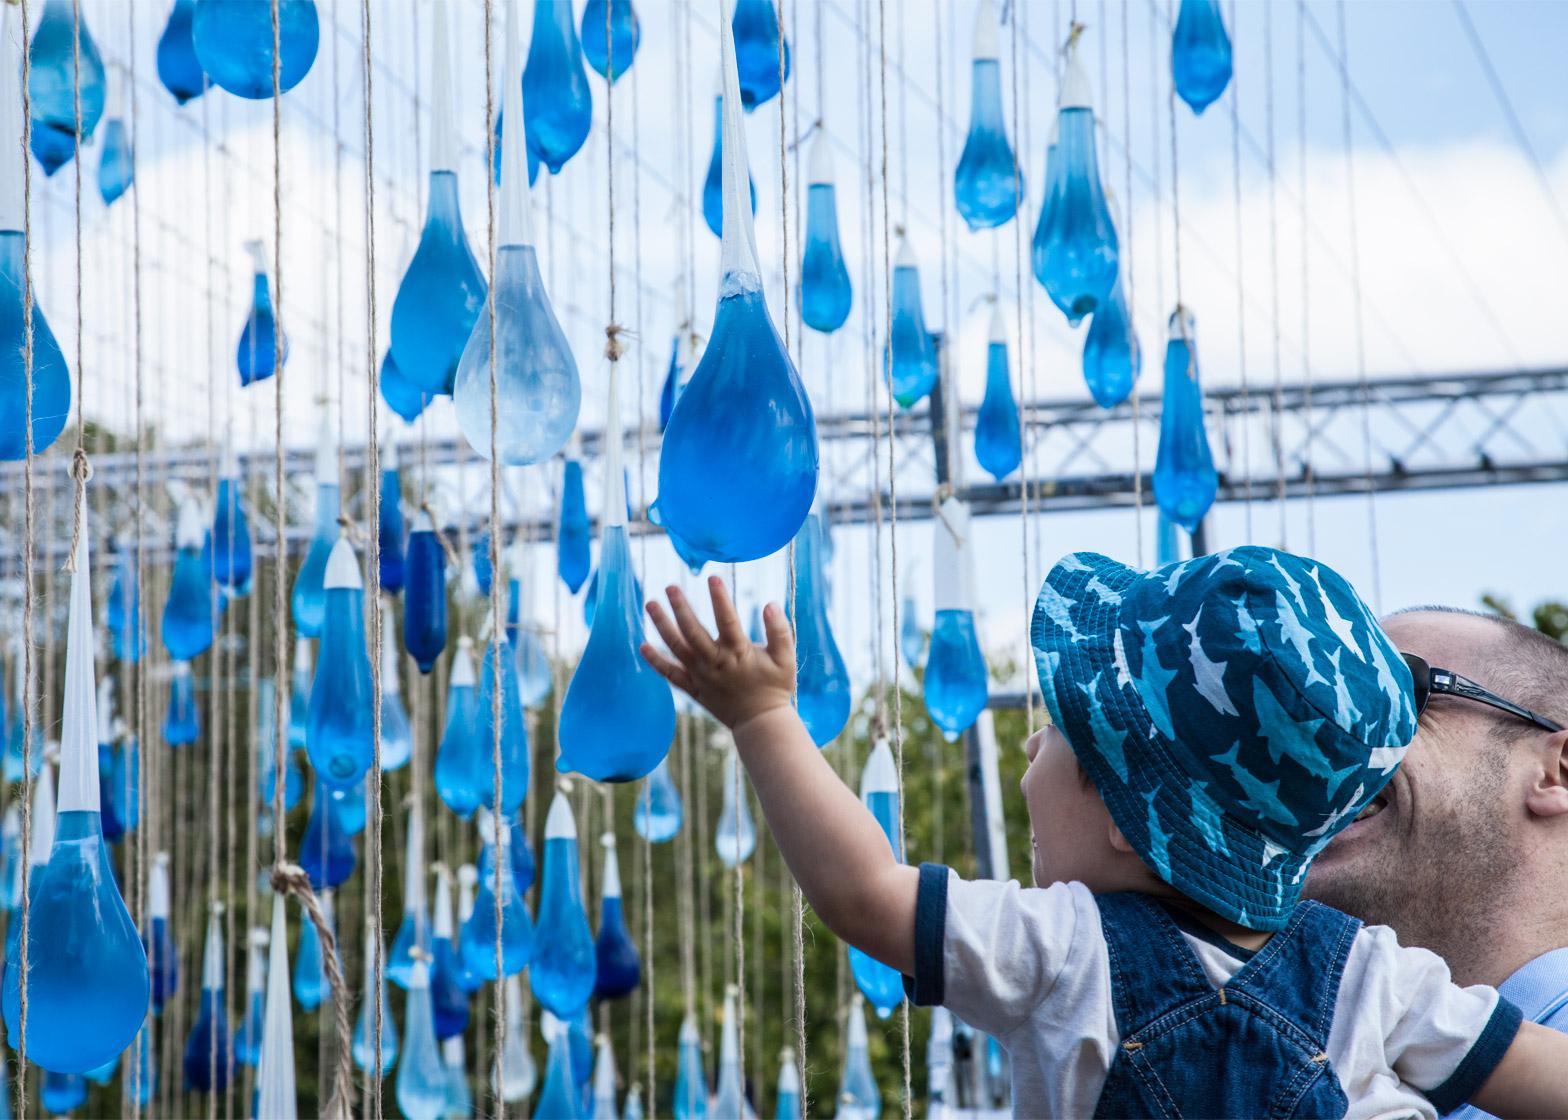 Luz-Interruptus-Rain-Interactive-installation-hisheji (13)